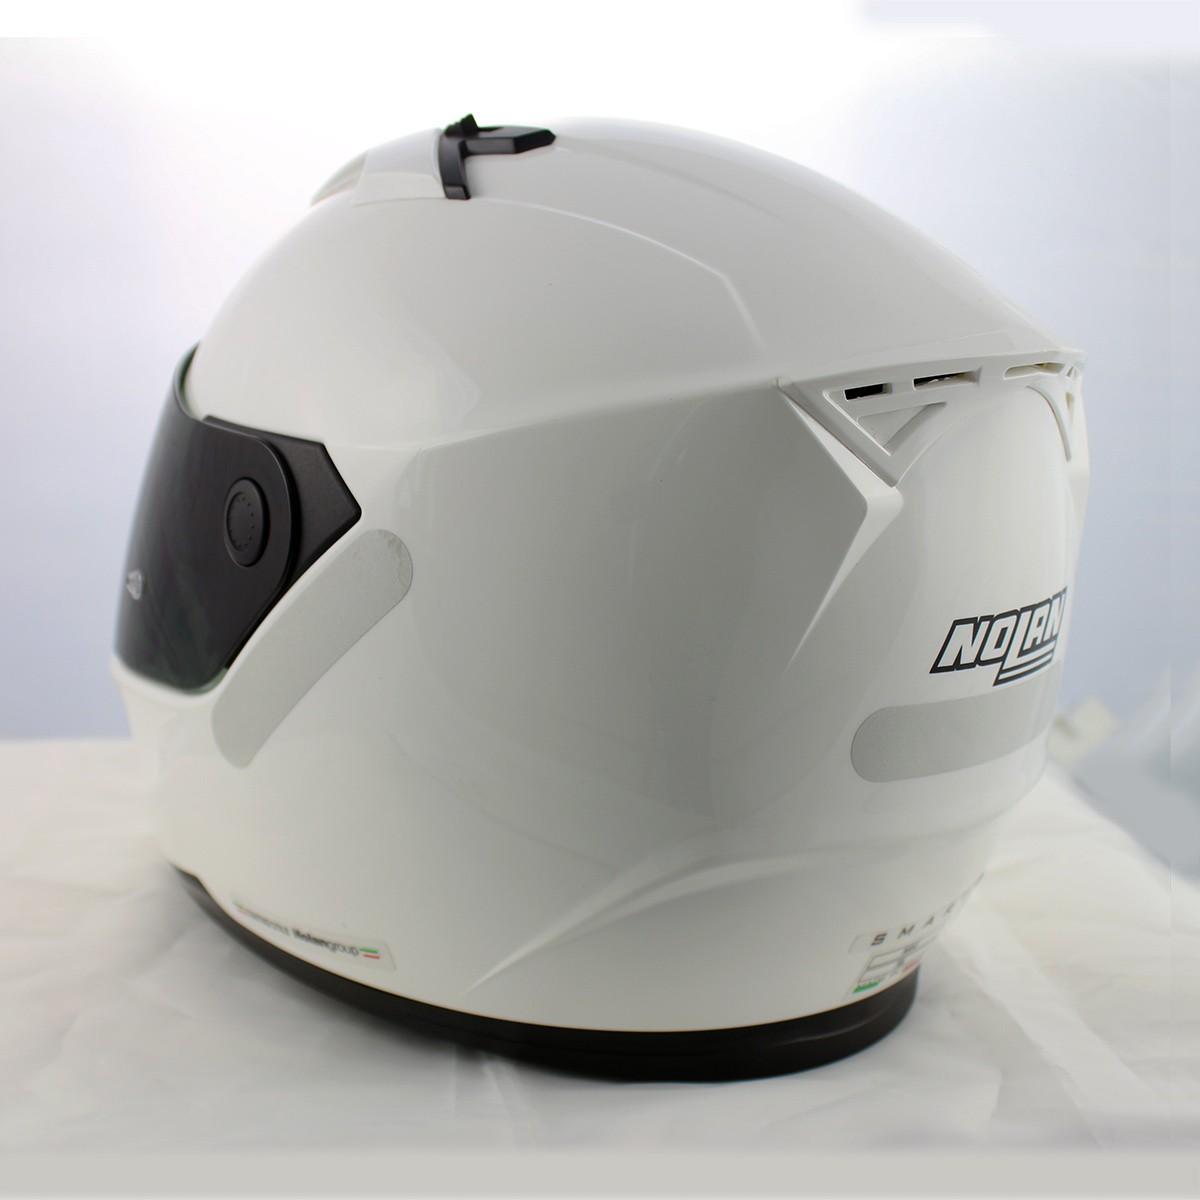 Capacete Nolan N64 Sport White - Ganhe Touca Balaclava (Agv k-3)  - Nova Suzuki Motos e Acessórios